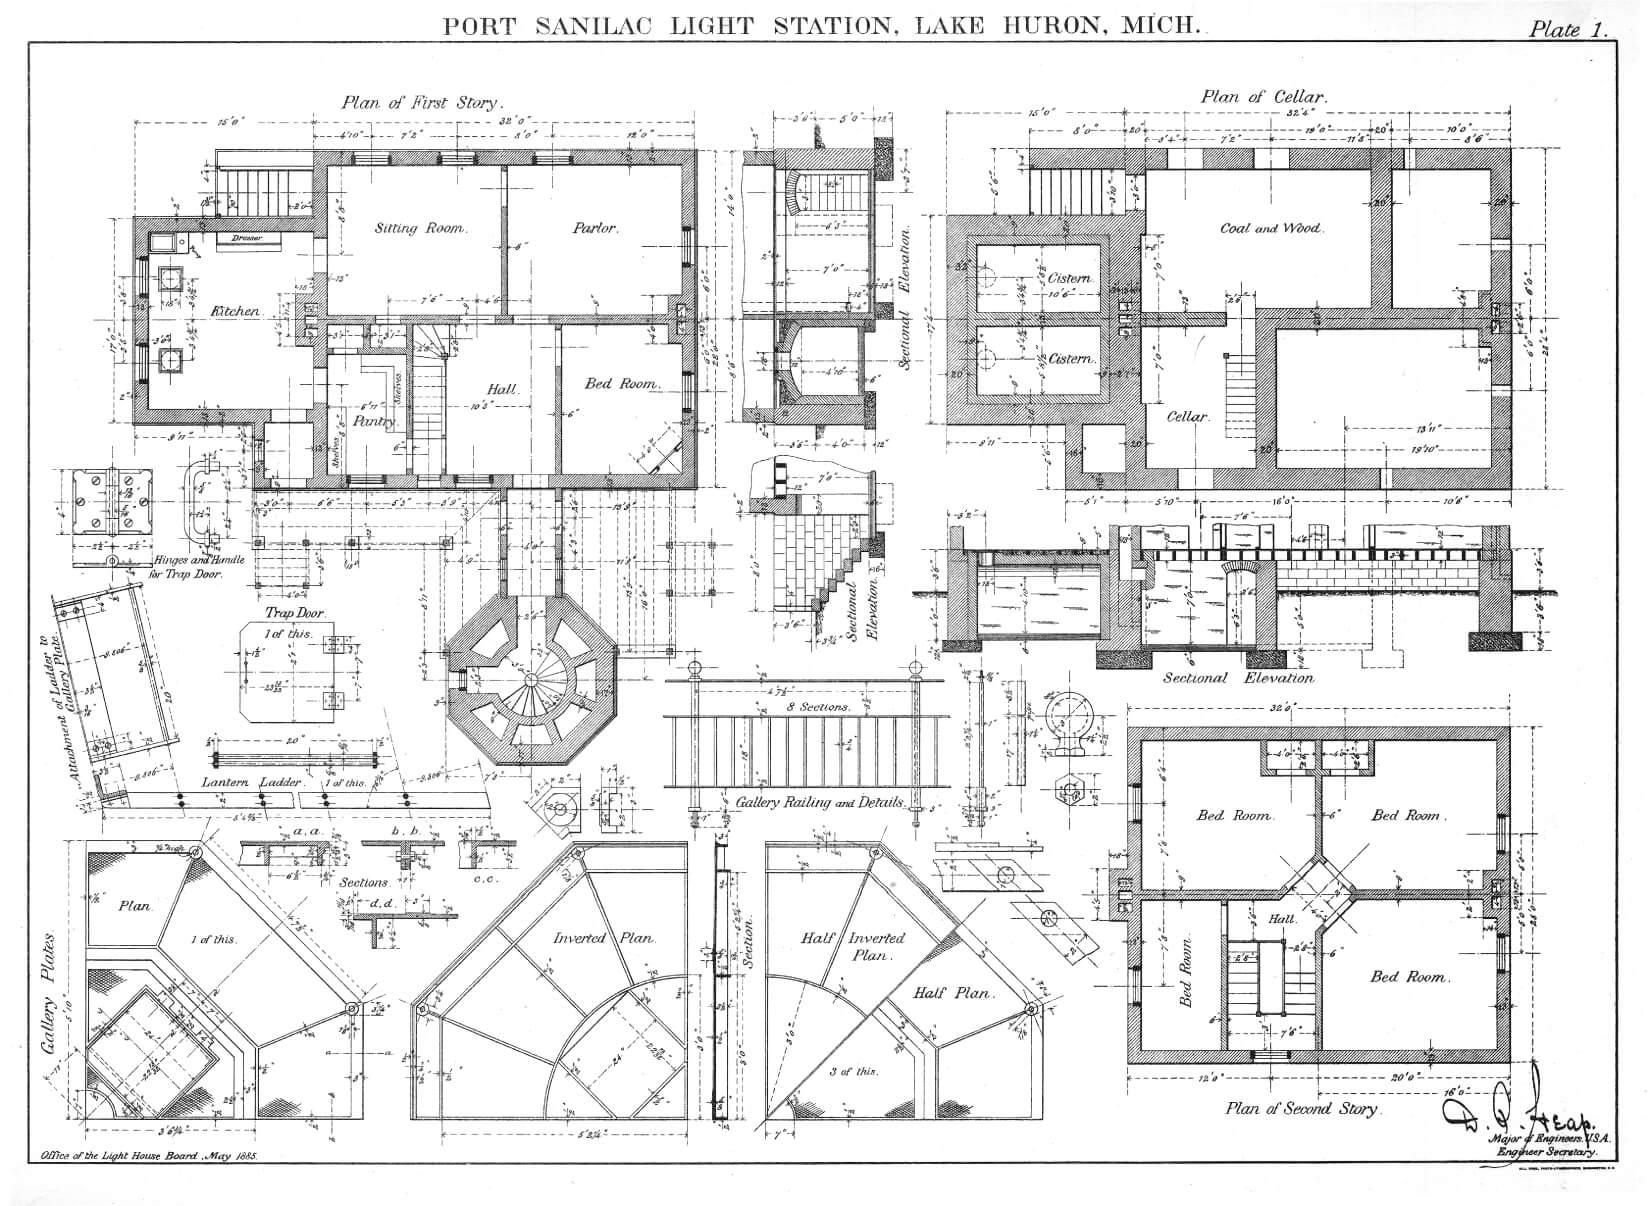 Port Sanilac LH Plate 1 Floor Plans 0